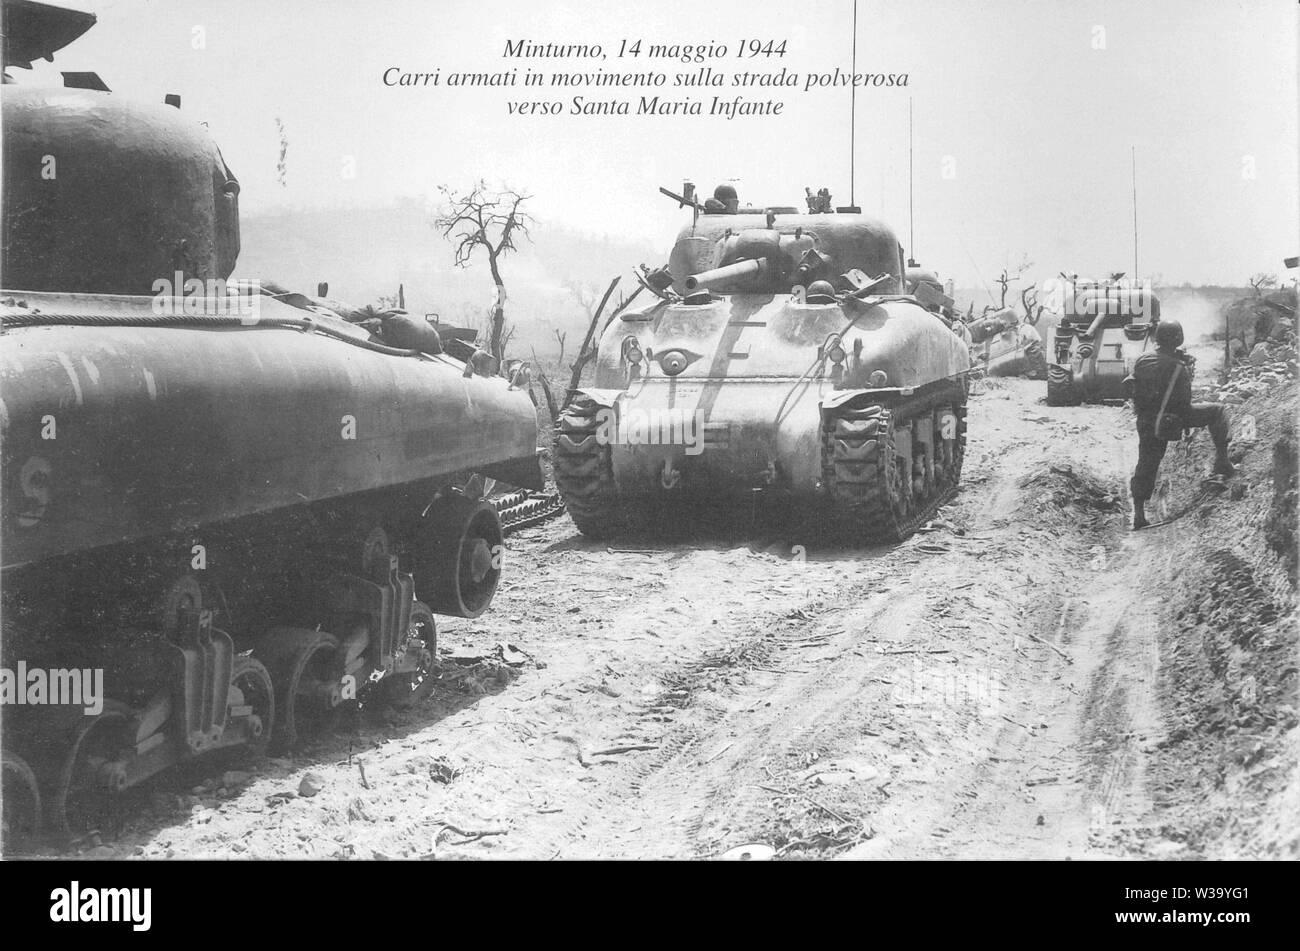 American tanks on 'Gustav line', Second World War, Minturno - Italy - Stock Image